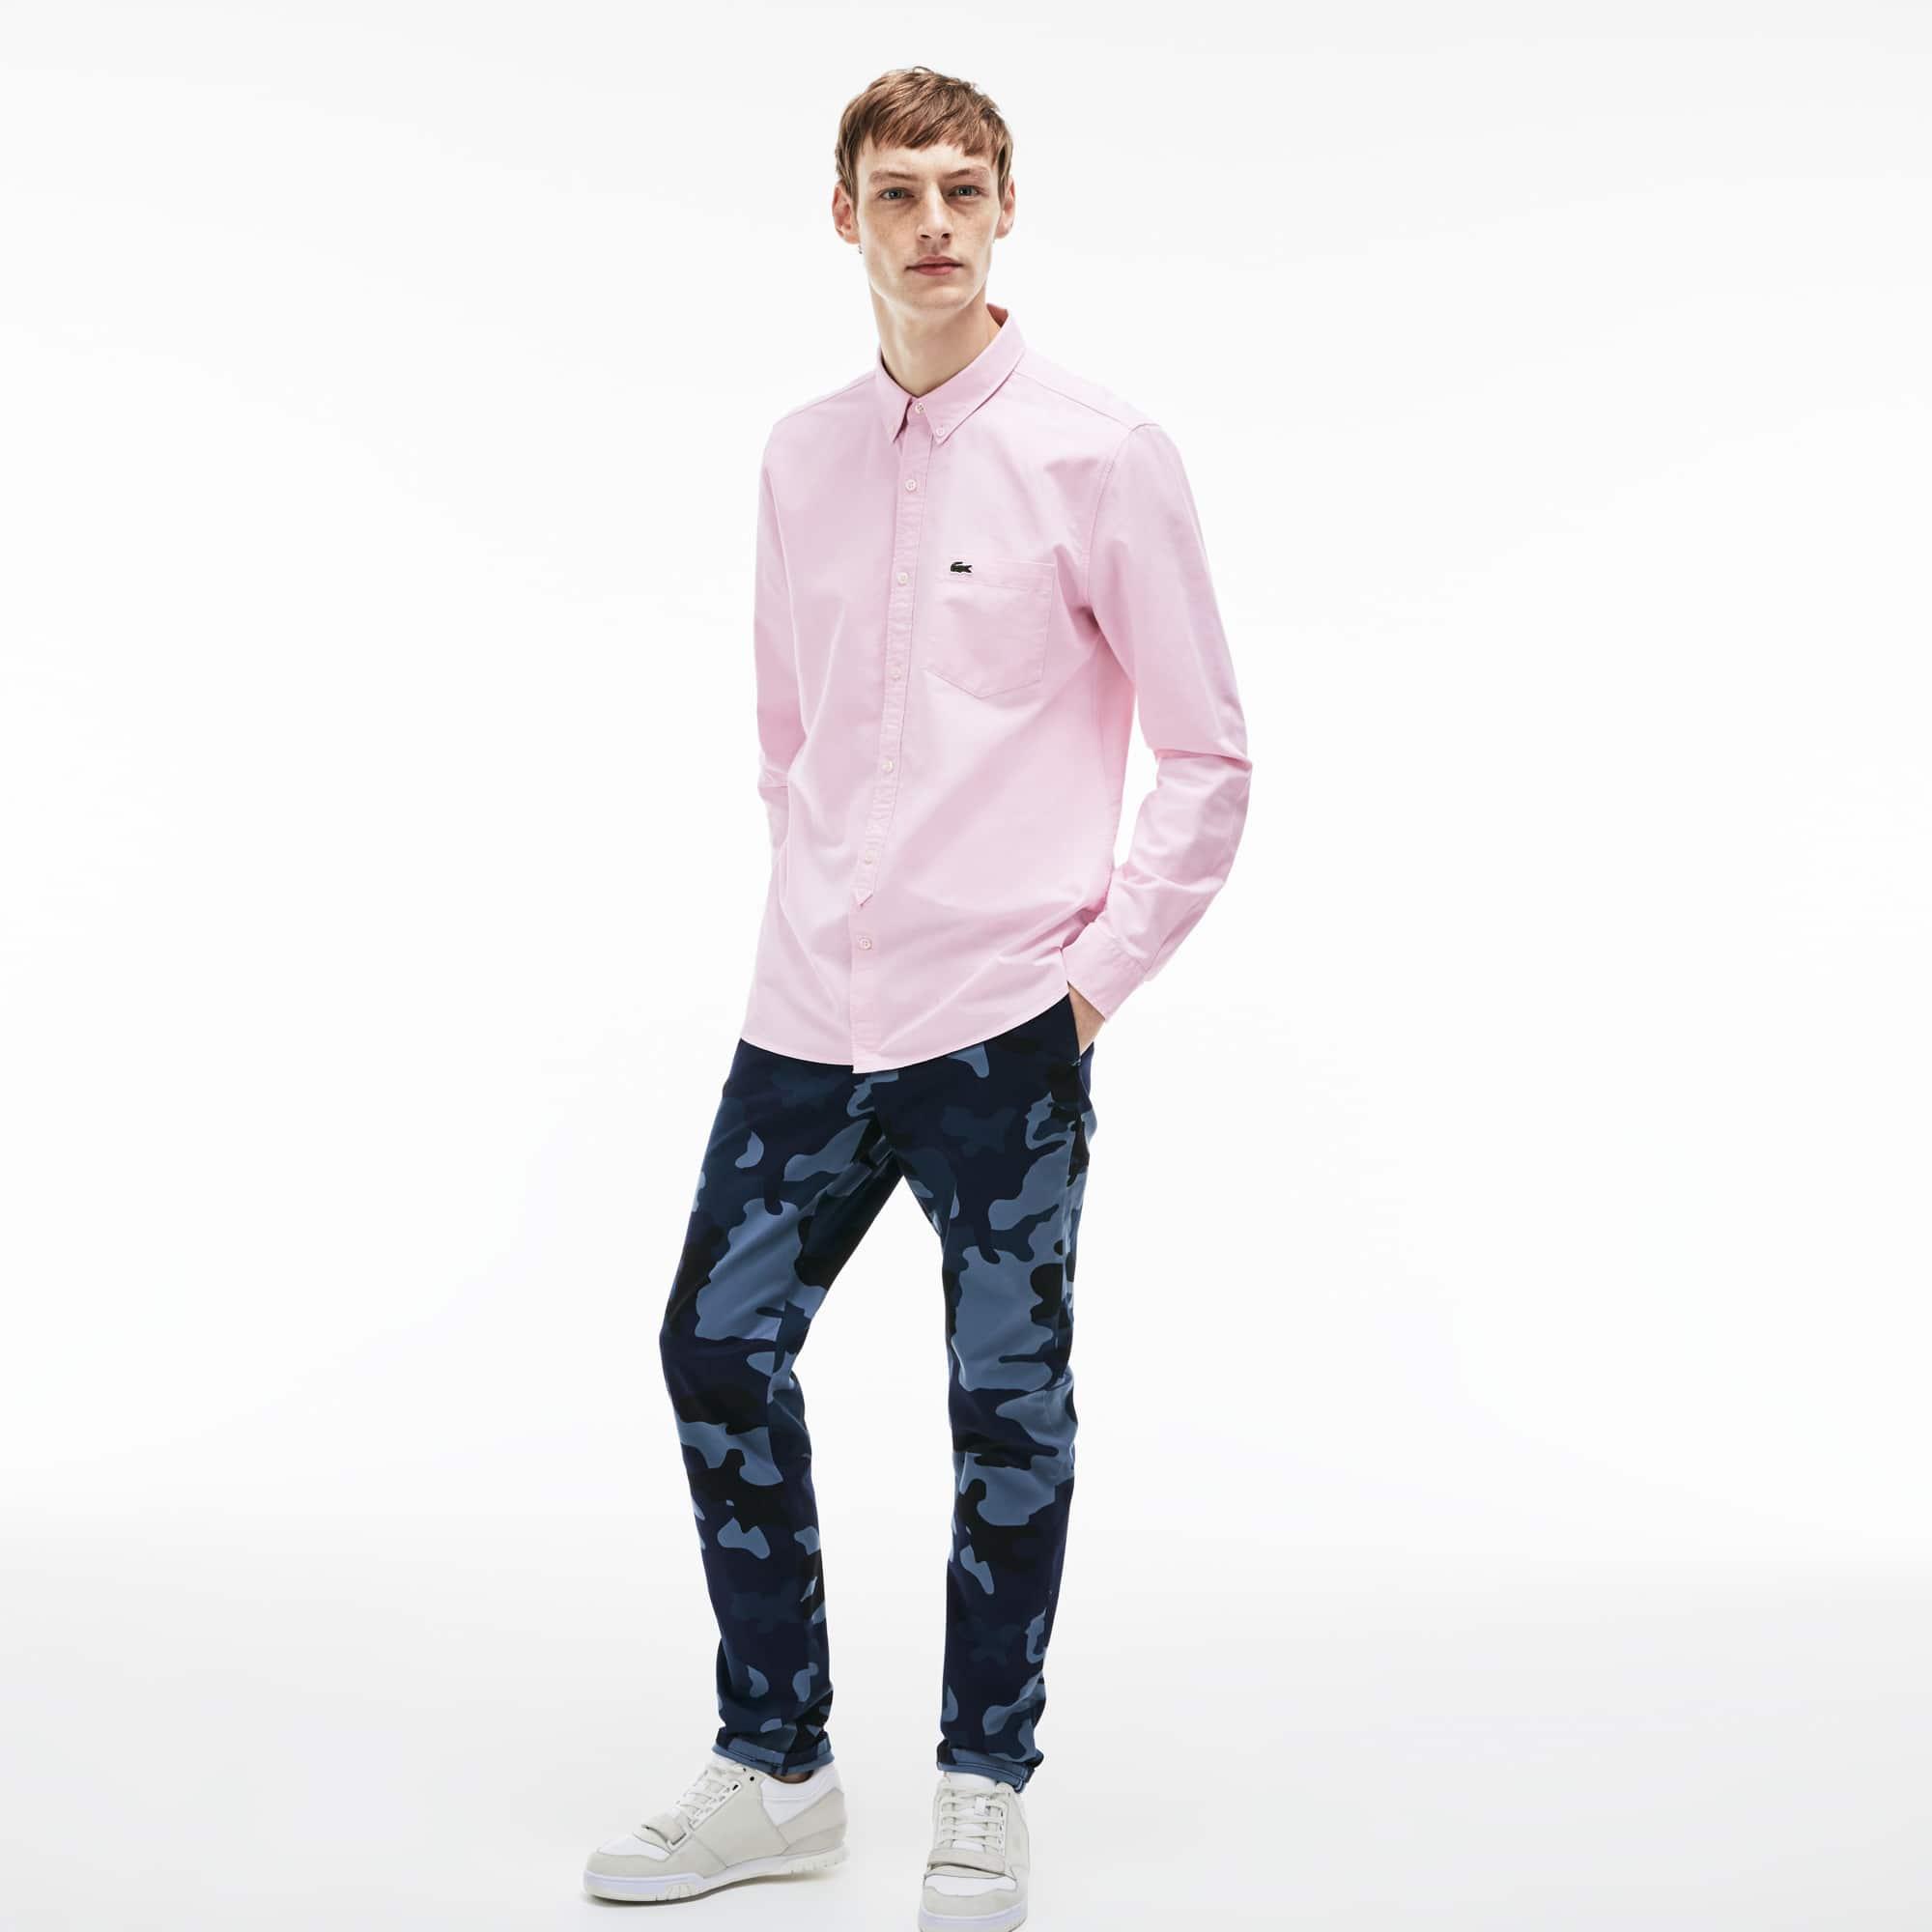 Camisa Skinny fit Lacoste LIVE em algodão Oxford unicolor   LACOSTE 94bd2f2dd4